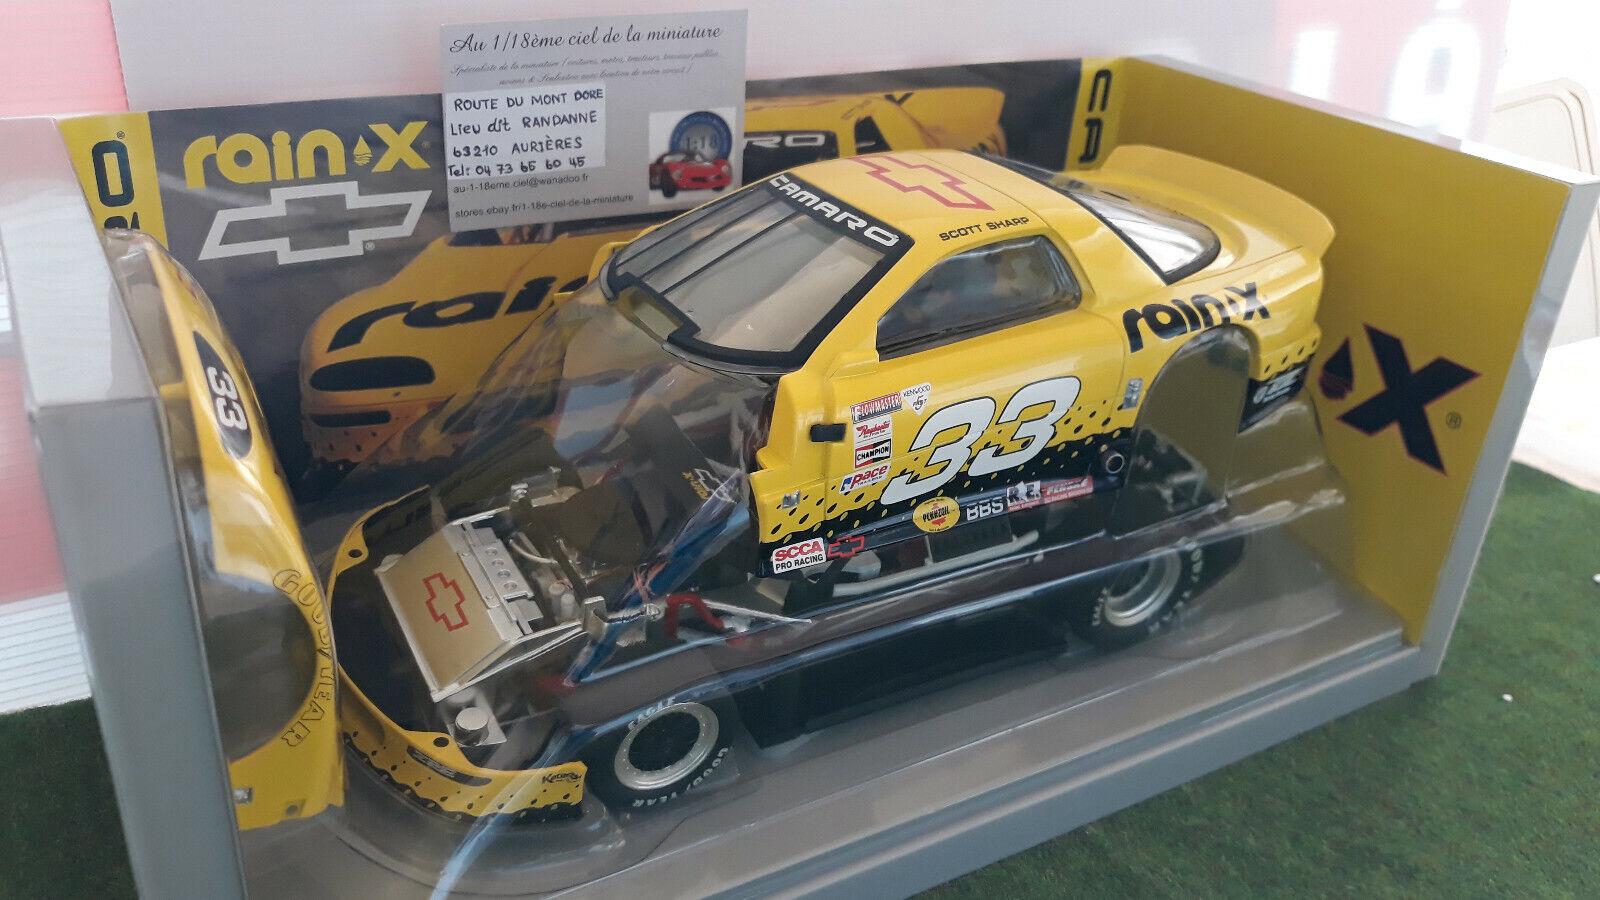 CHEVROLET CAMARO RAIN-X SCOTT SHARP   33 jaune 1 18 GMP 13005 voiture miniat